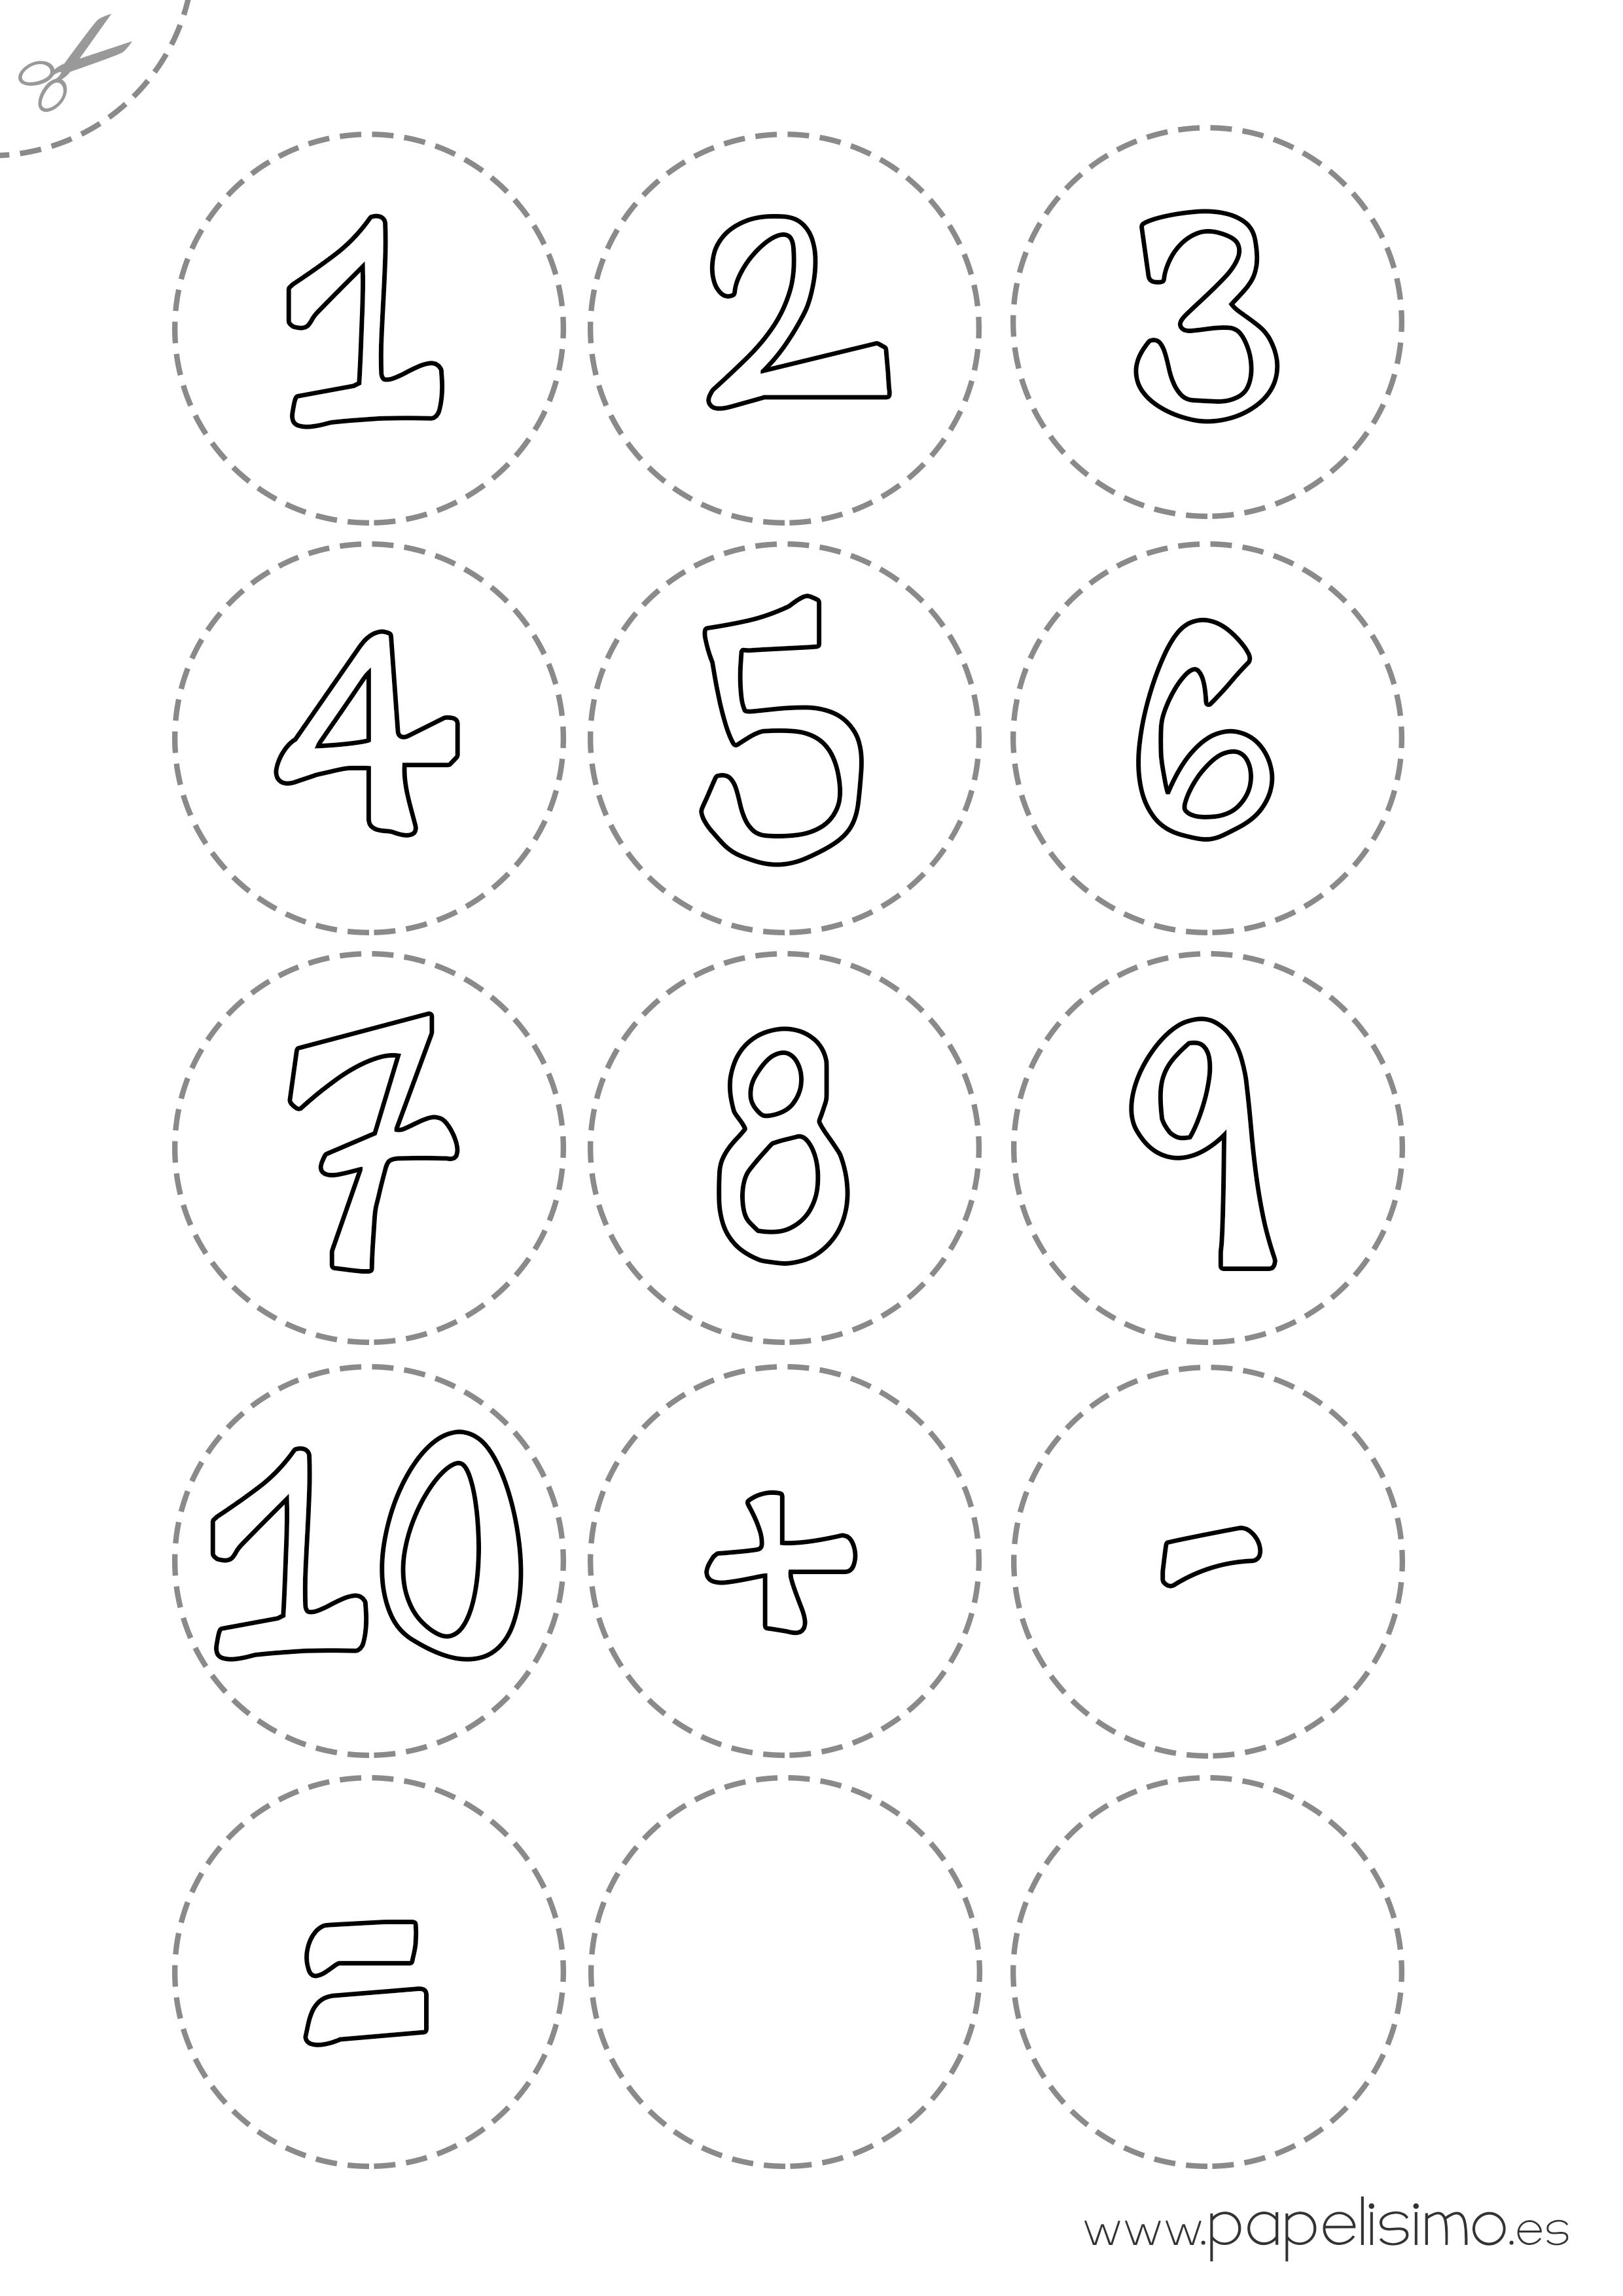 Pin de MAVE en INFANTIL   Pinterest   Números, Preescolar y Escuela